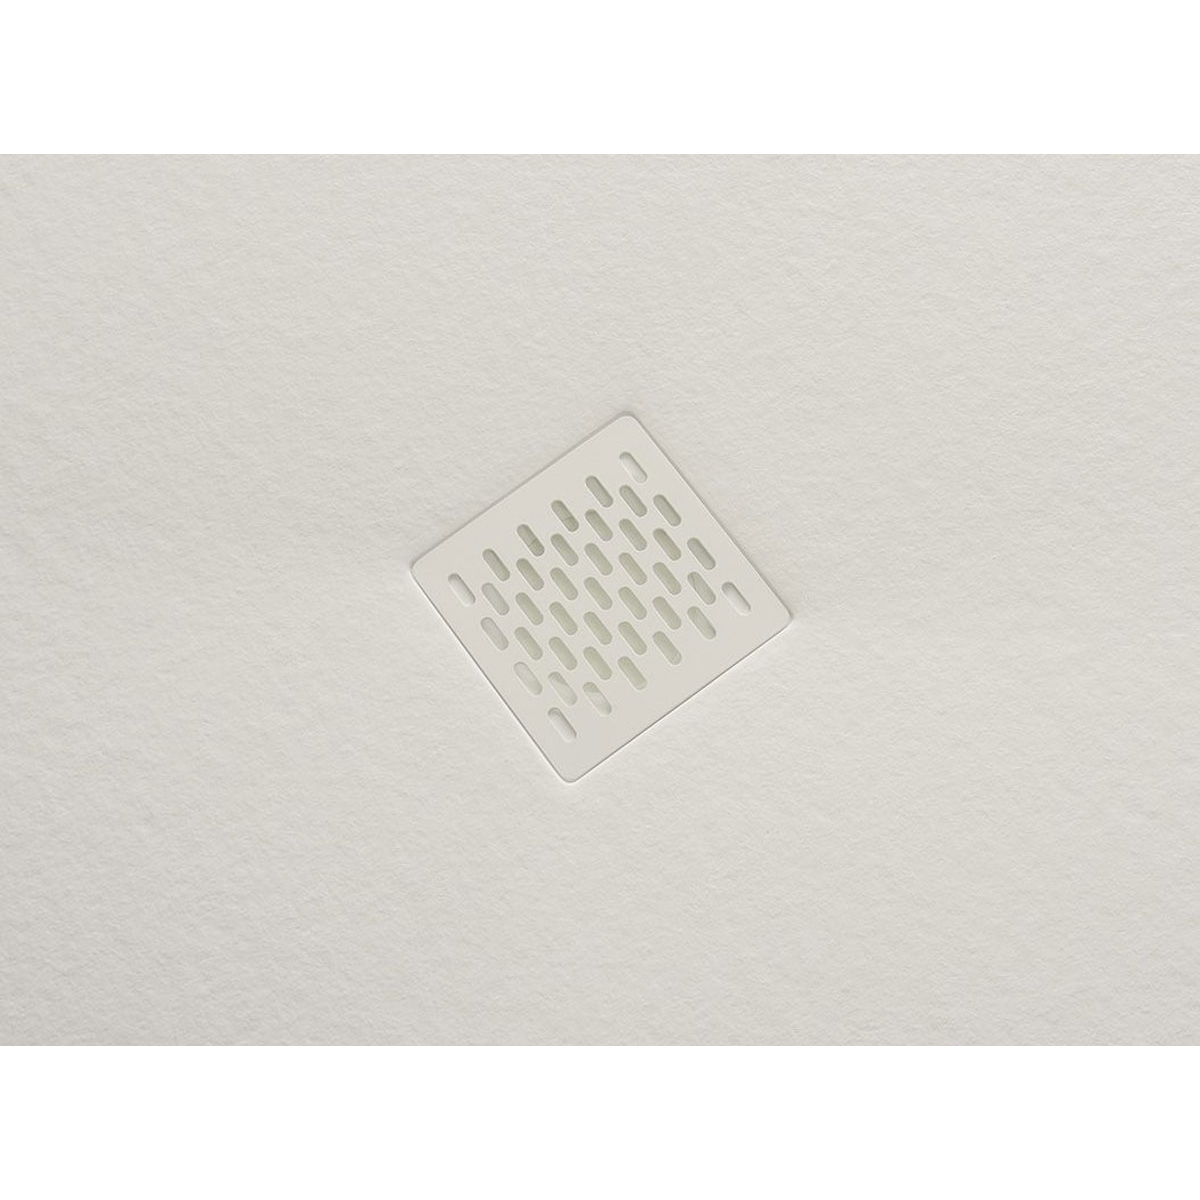 Plato de ducha rectangular 100x80 Coliseo Stone Nox Marfil